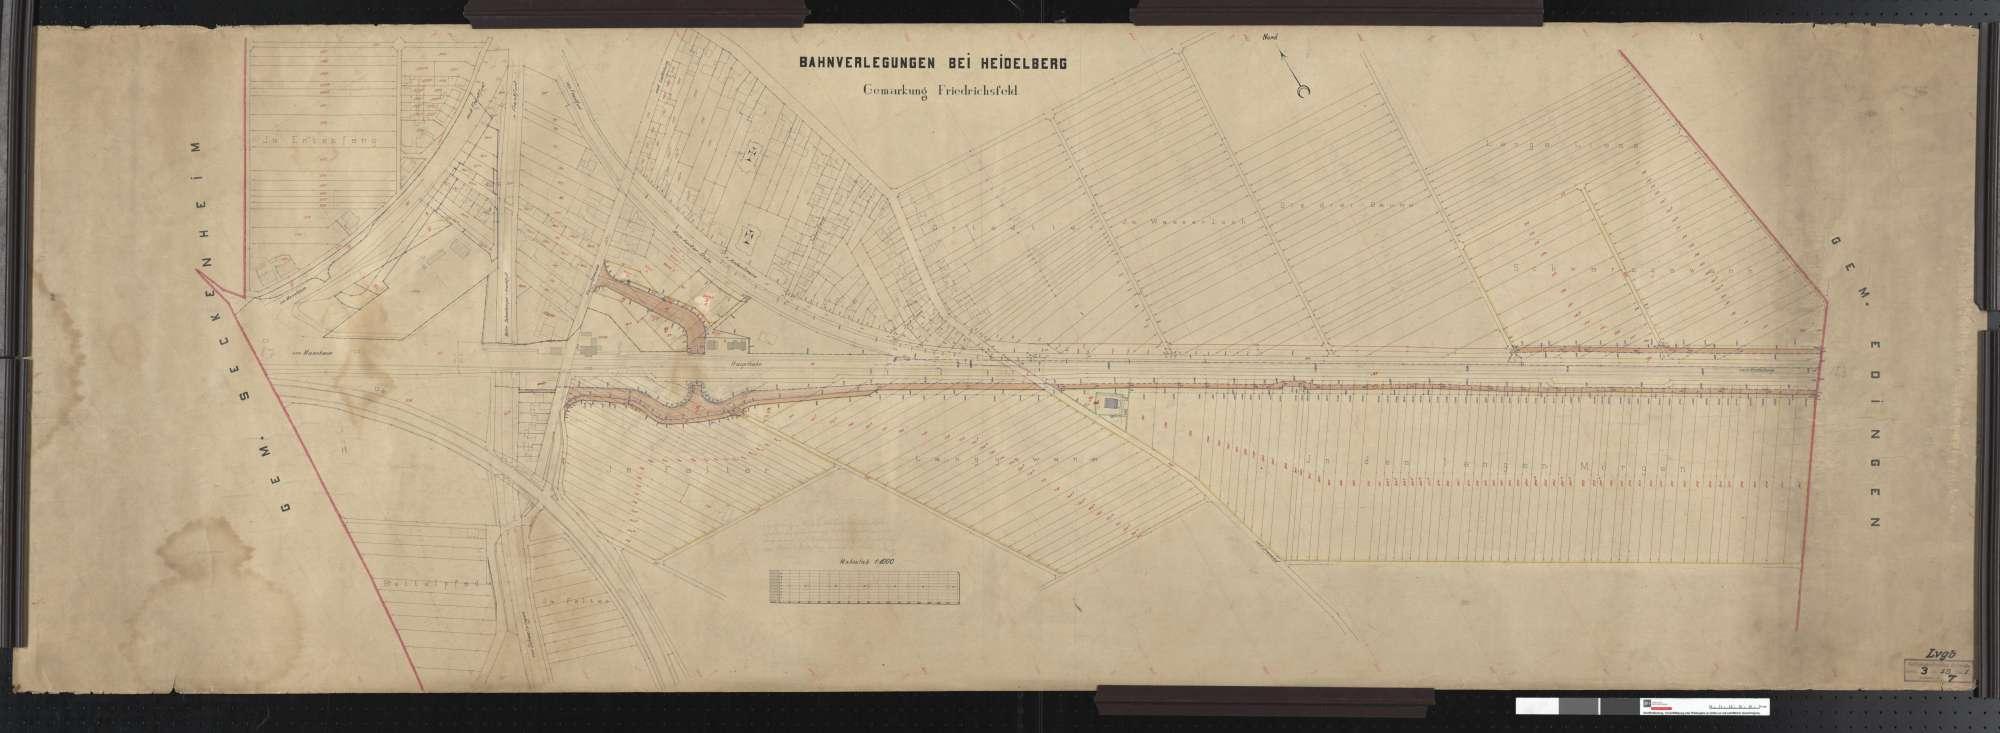 Situationsplan der Bahnverlegungen bei Heidelbeg: Gemarkung Friedrichsfeld Streckenausschnitt: 8,7 bis 10,3 km, Bild 1